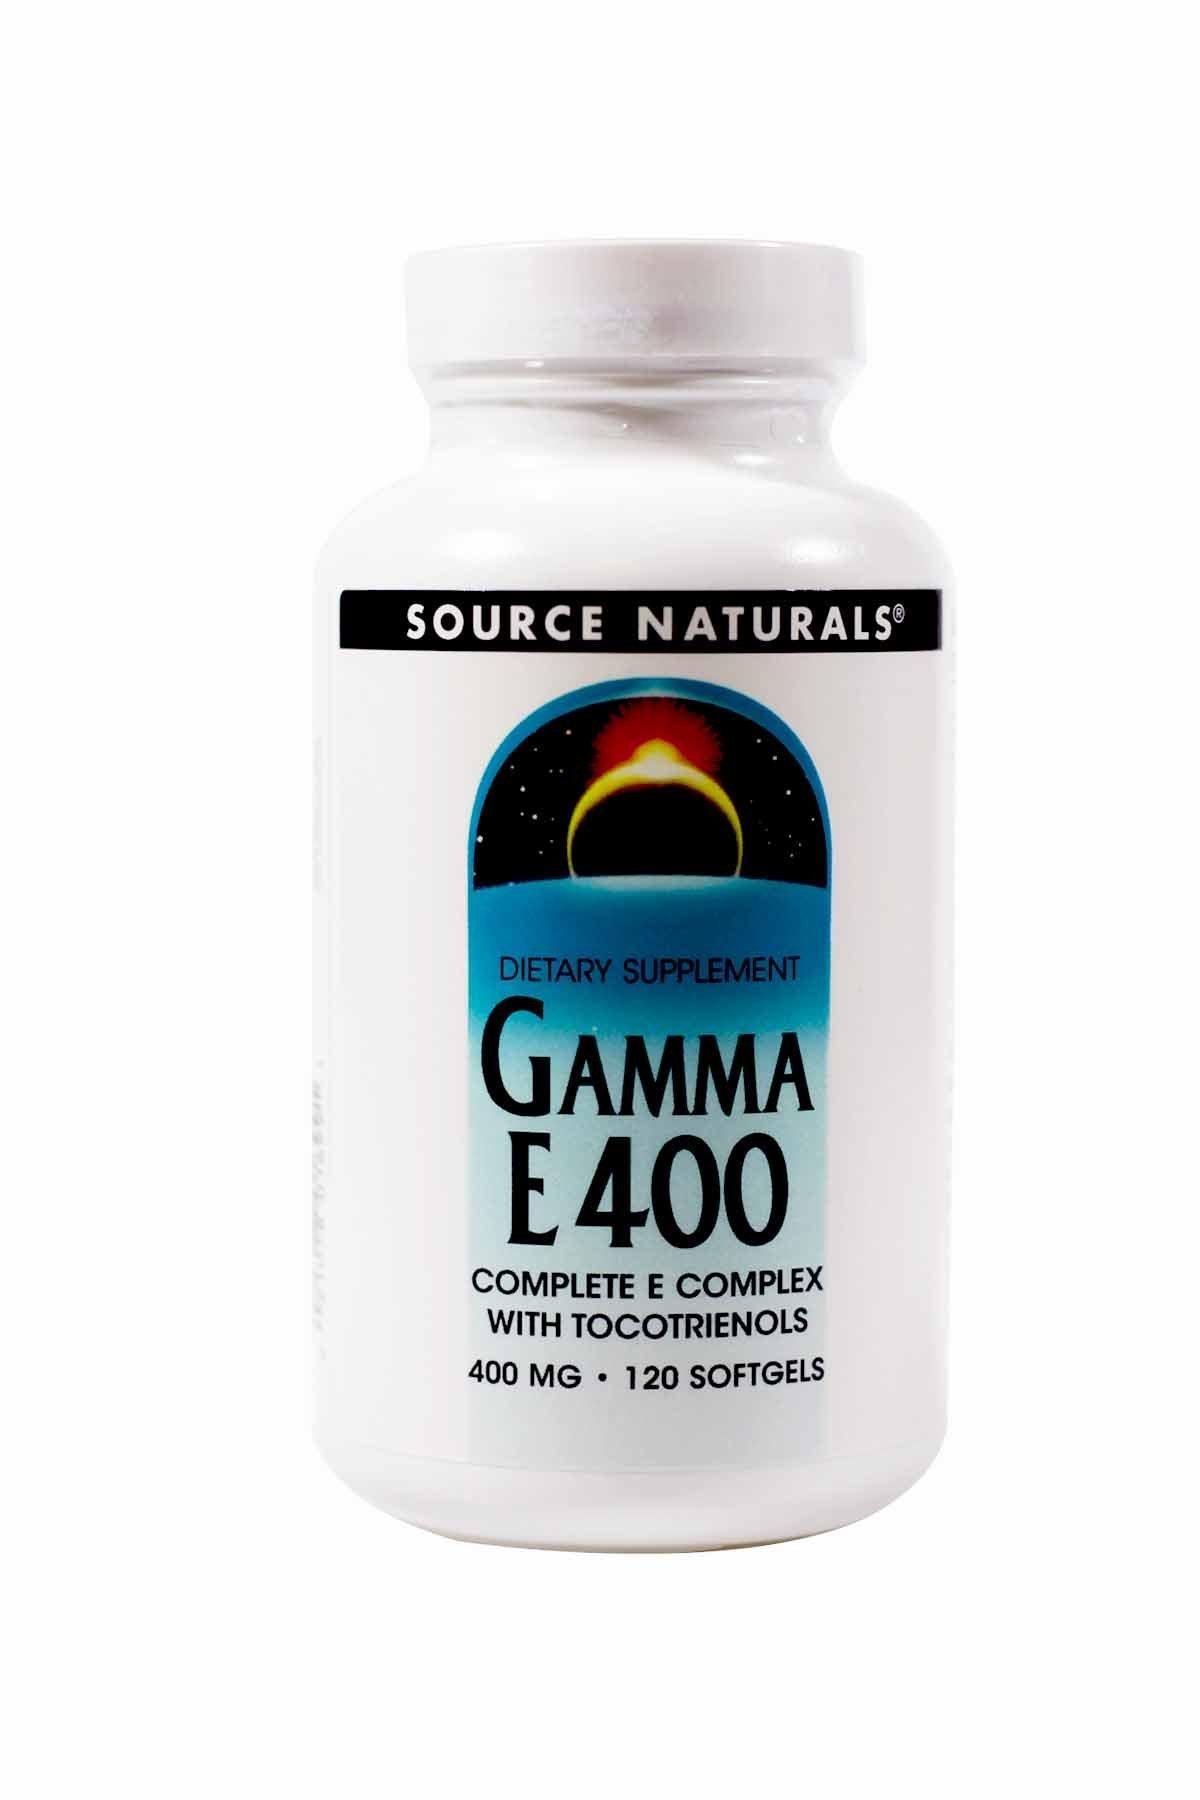 SOURCE NATURALS Gamma E Complex 400 Mg Soft Gel, 120 Count by Source Naturals